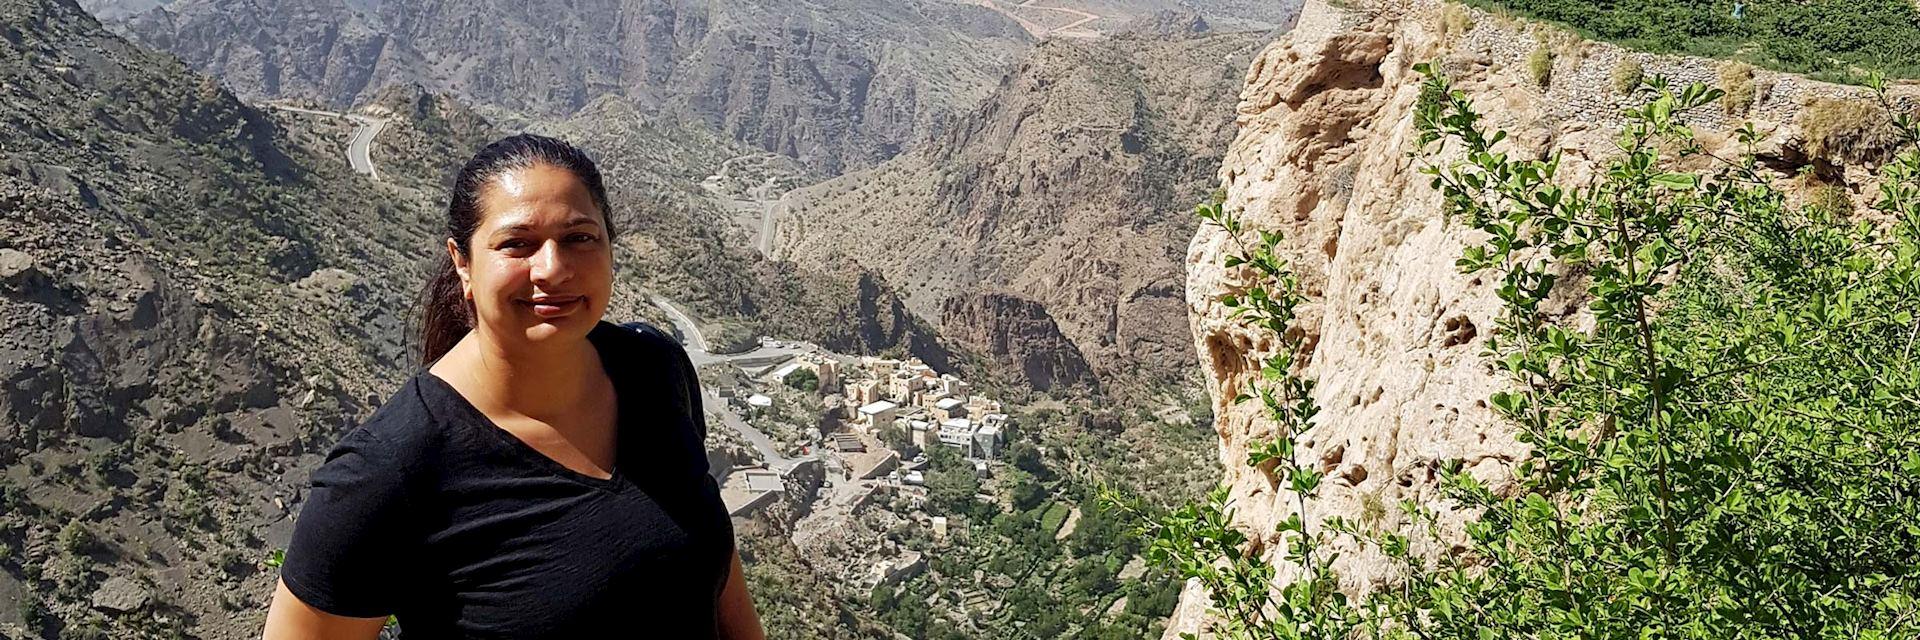 Shameem in Jebel Akhdar, Oman